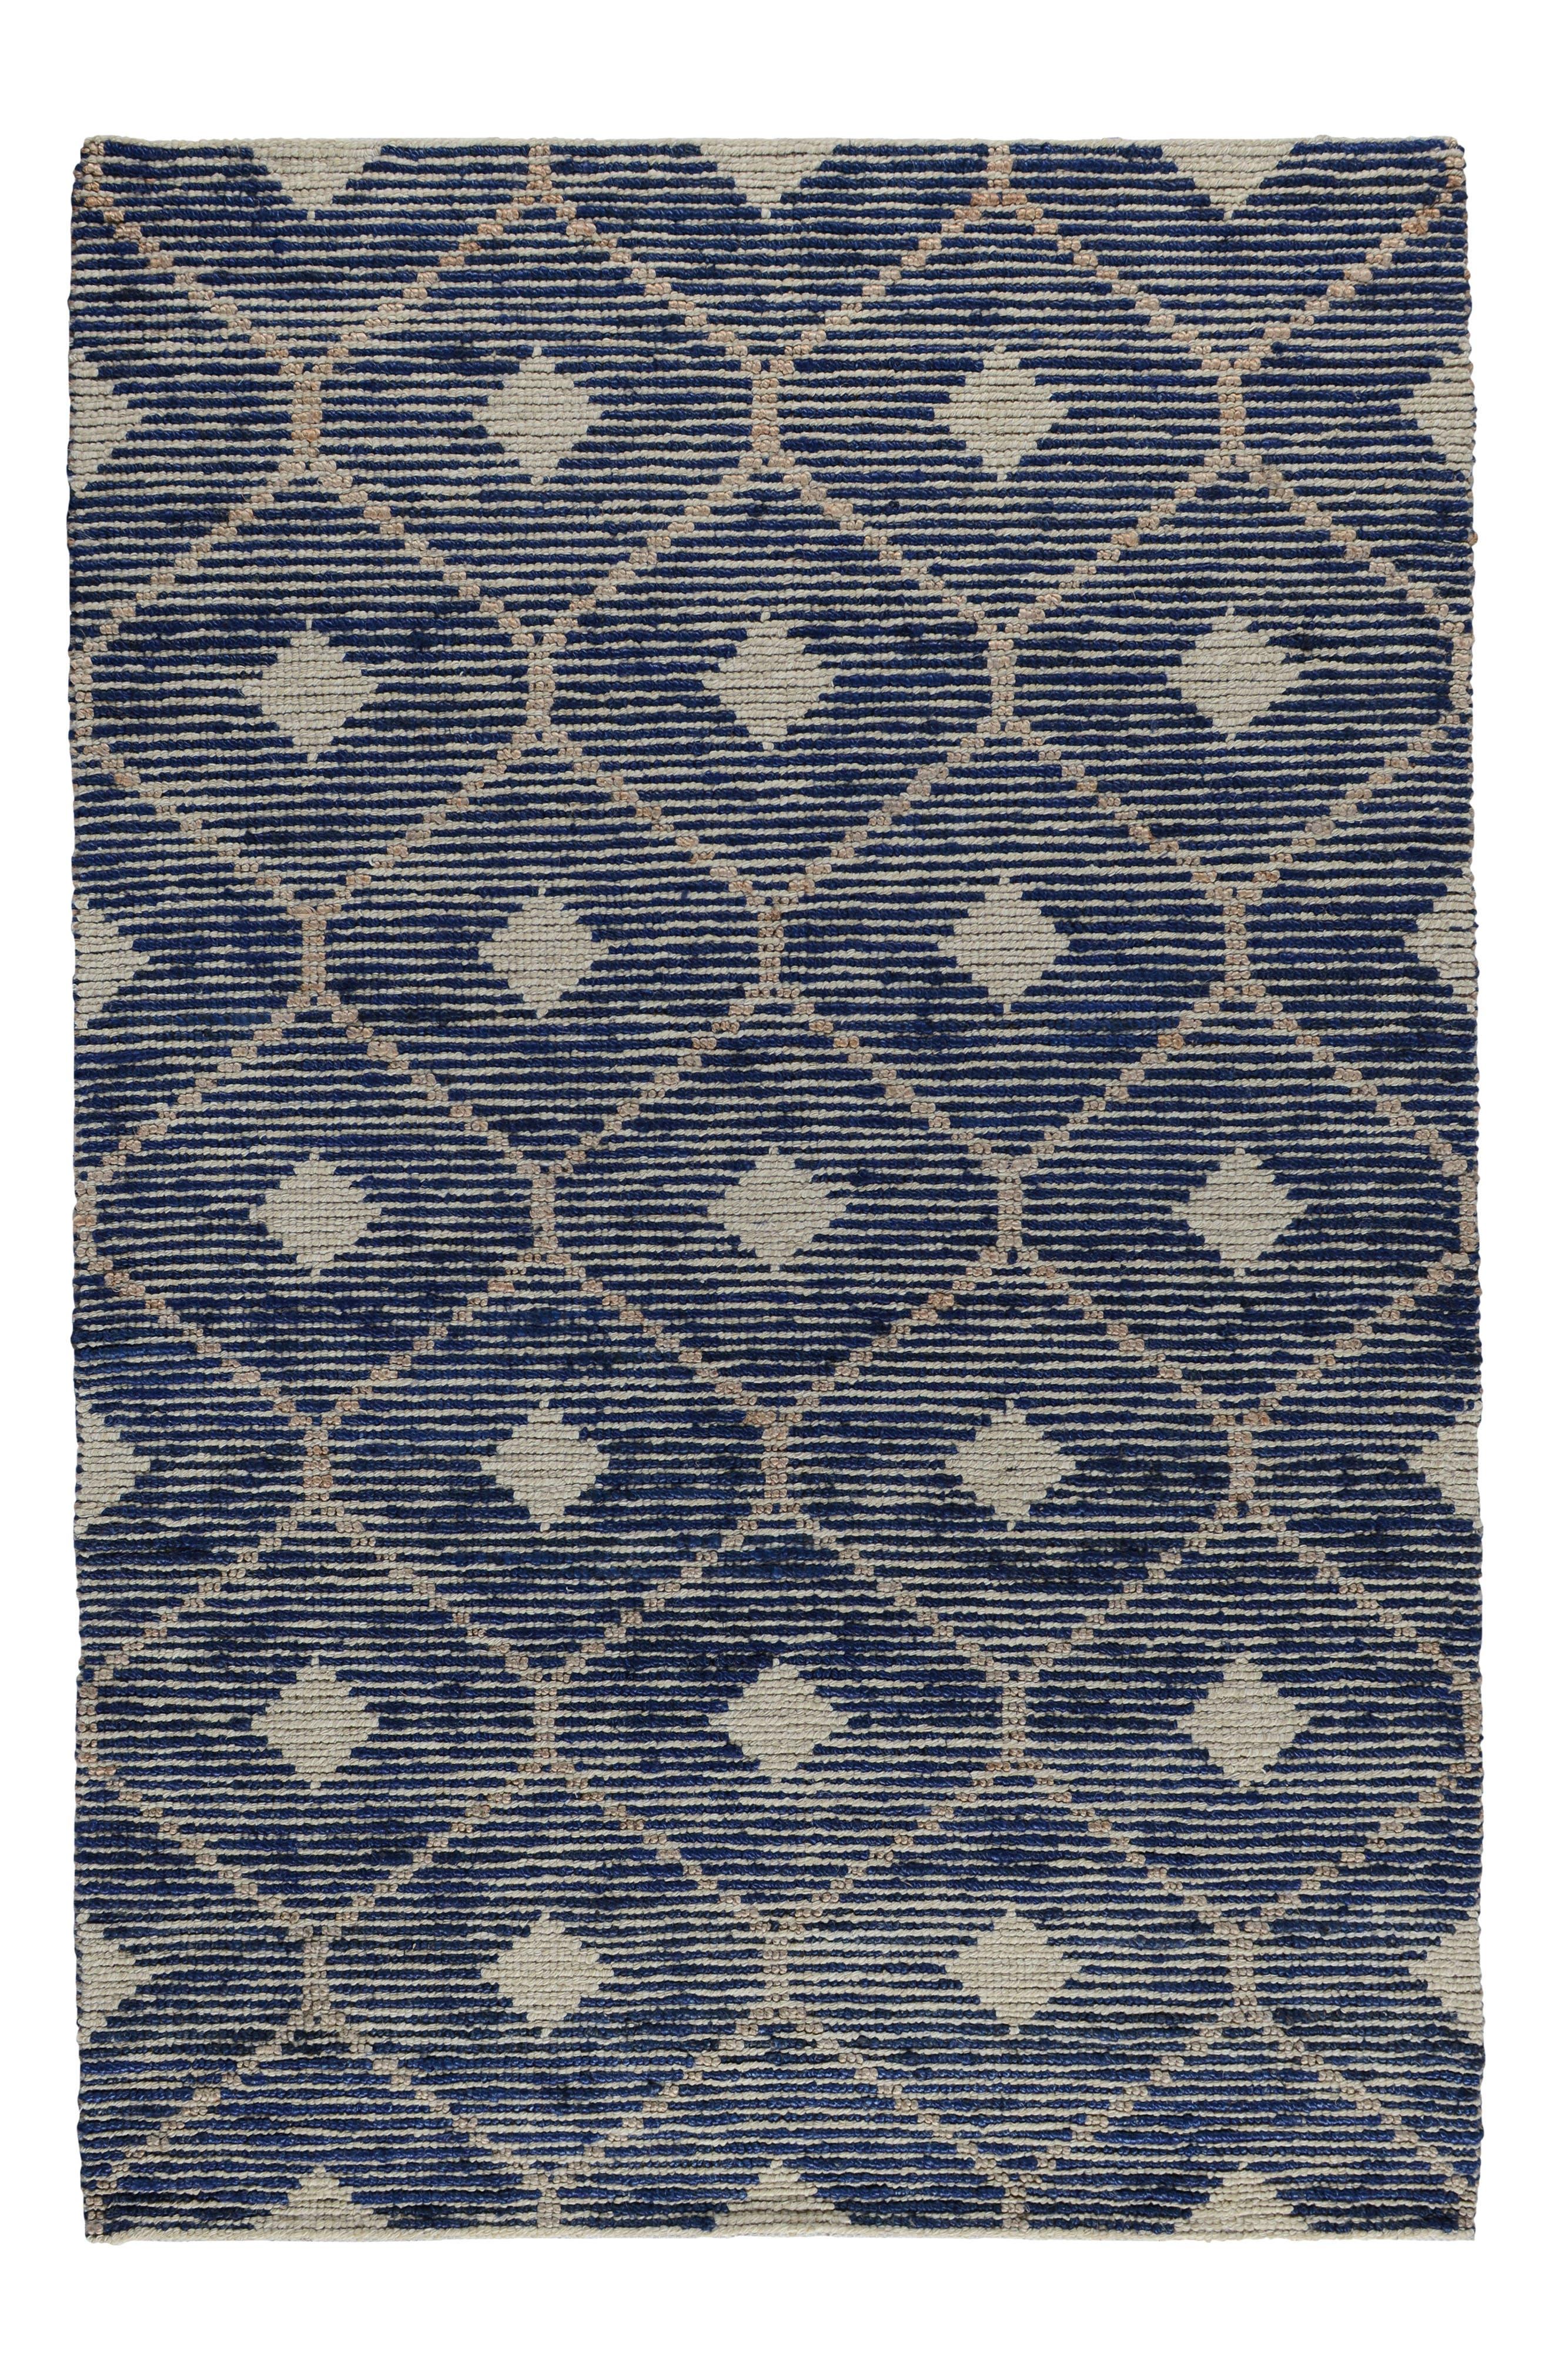 Villa Home Collection Rustica Handwoven Rug